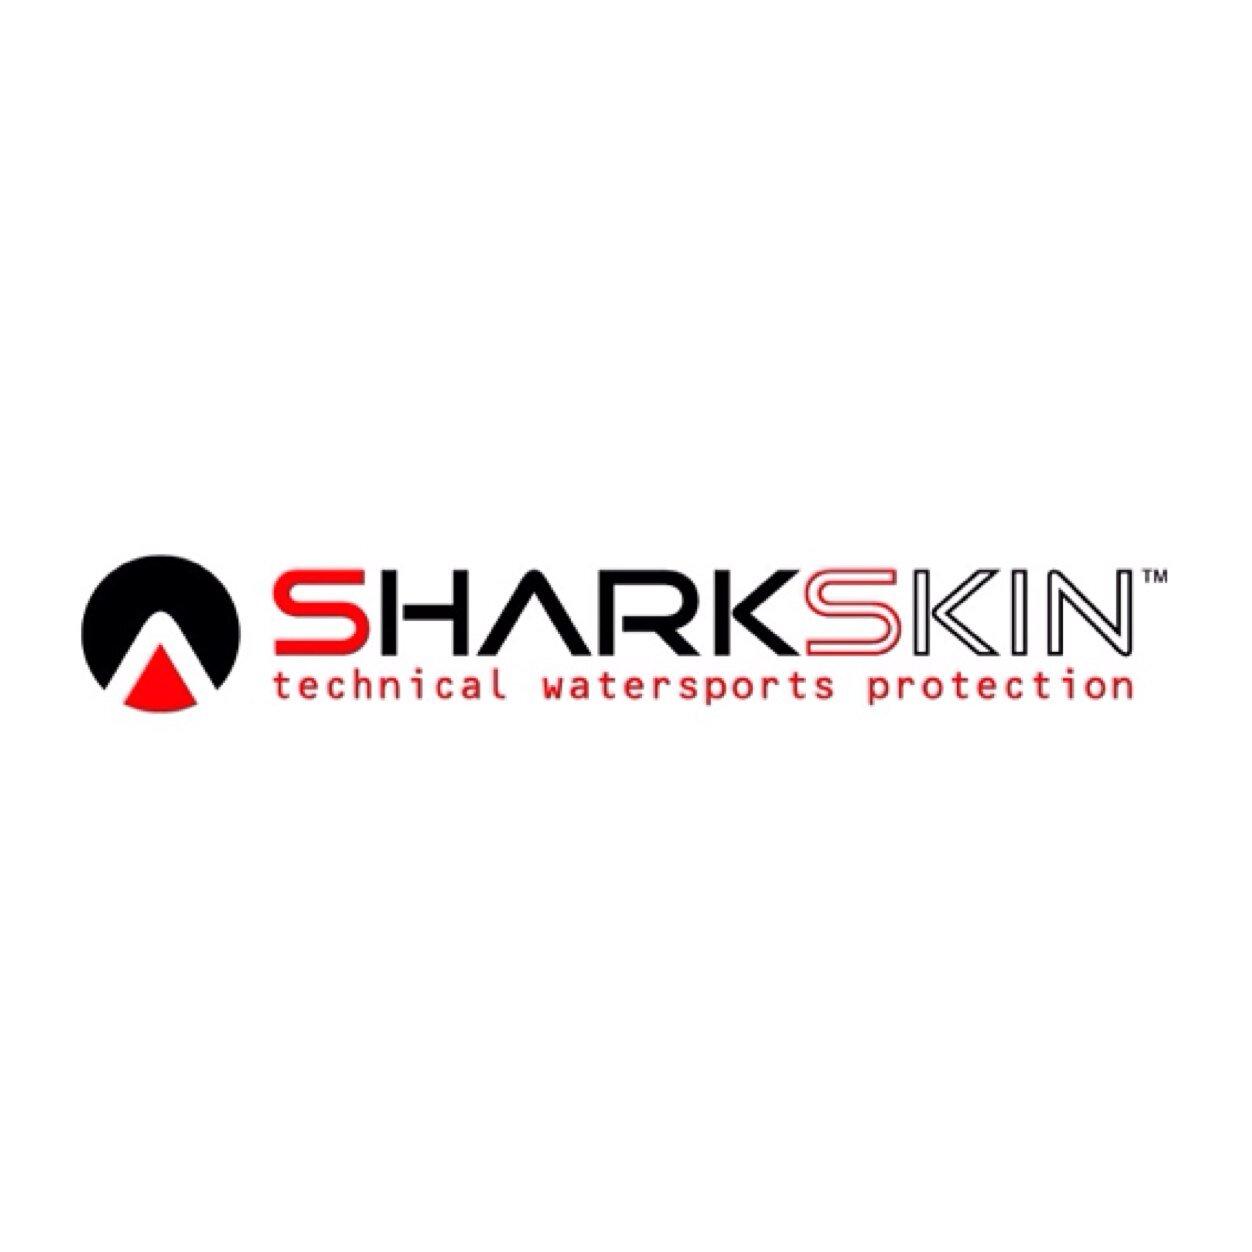 Image result for sharkskin logo